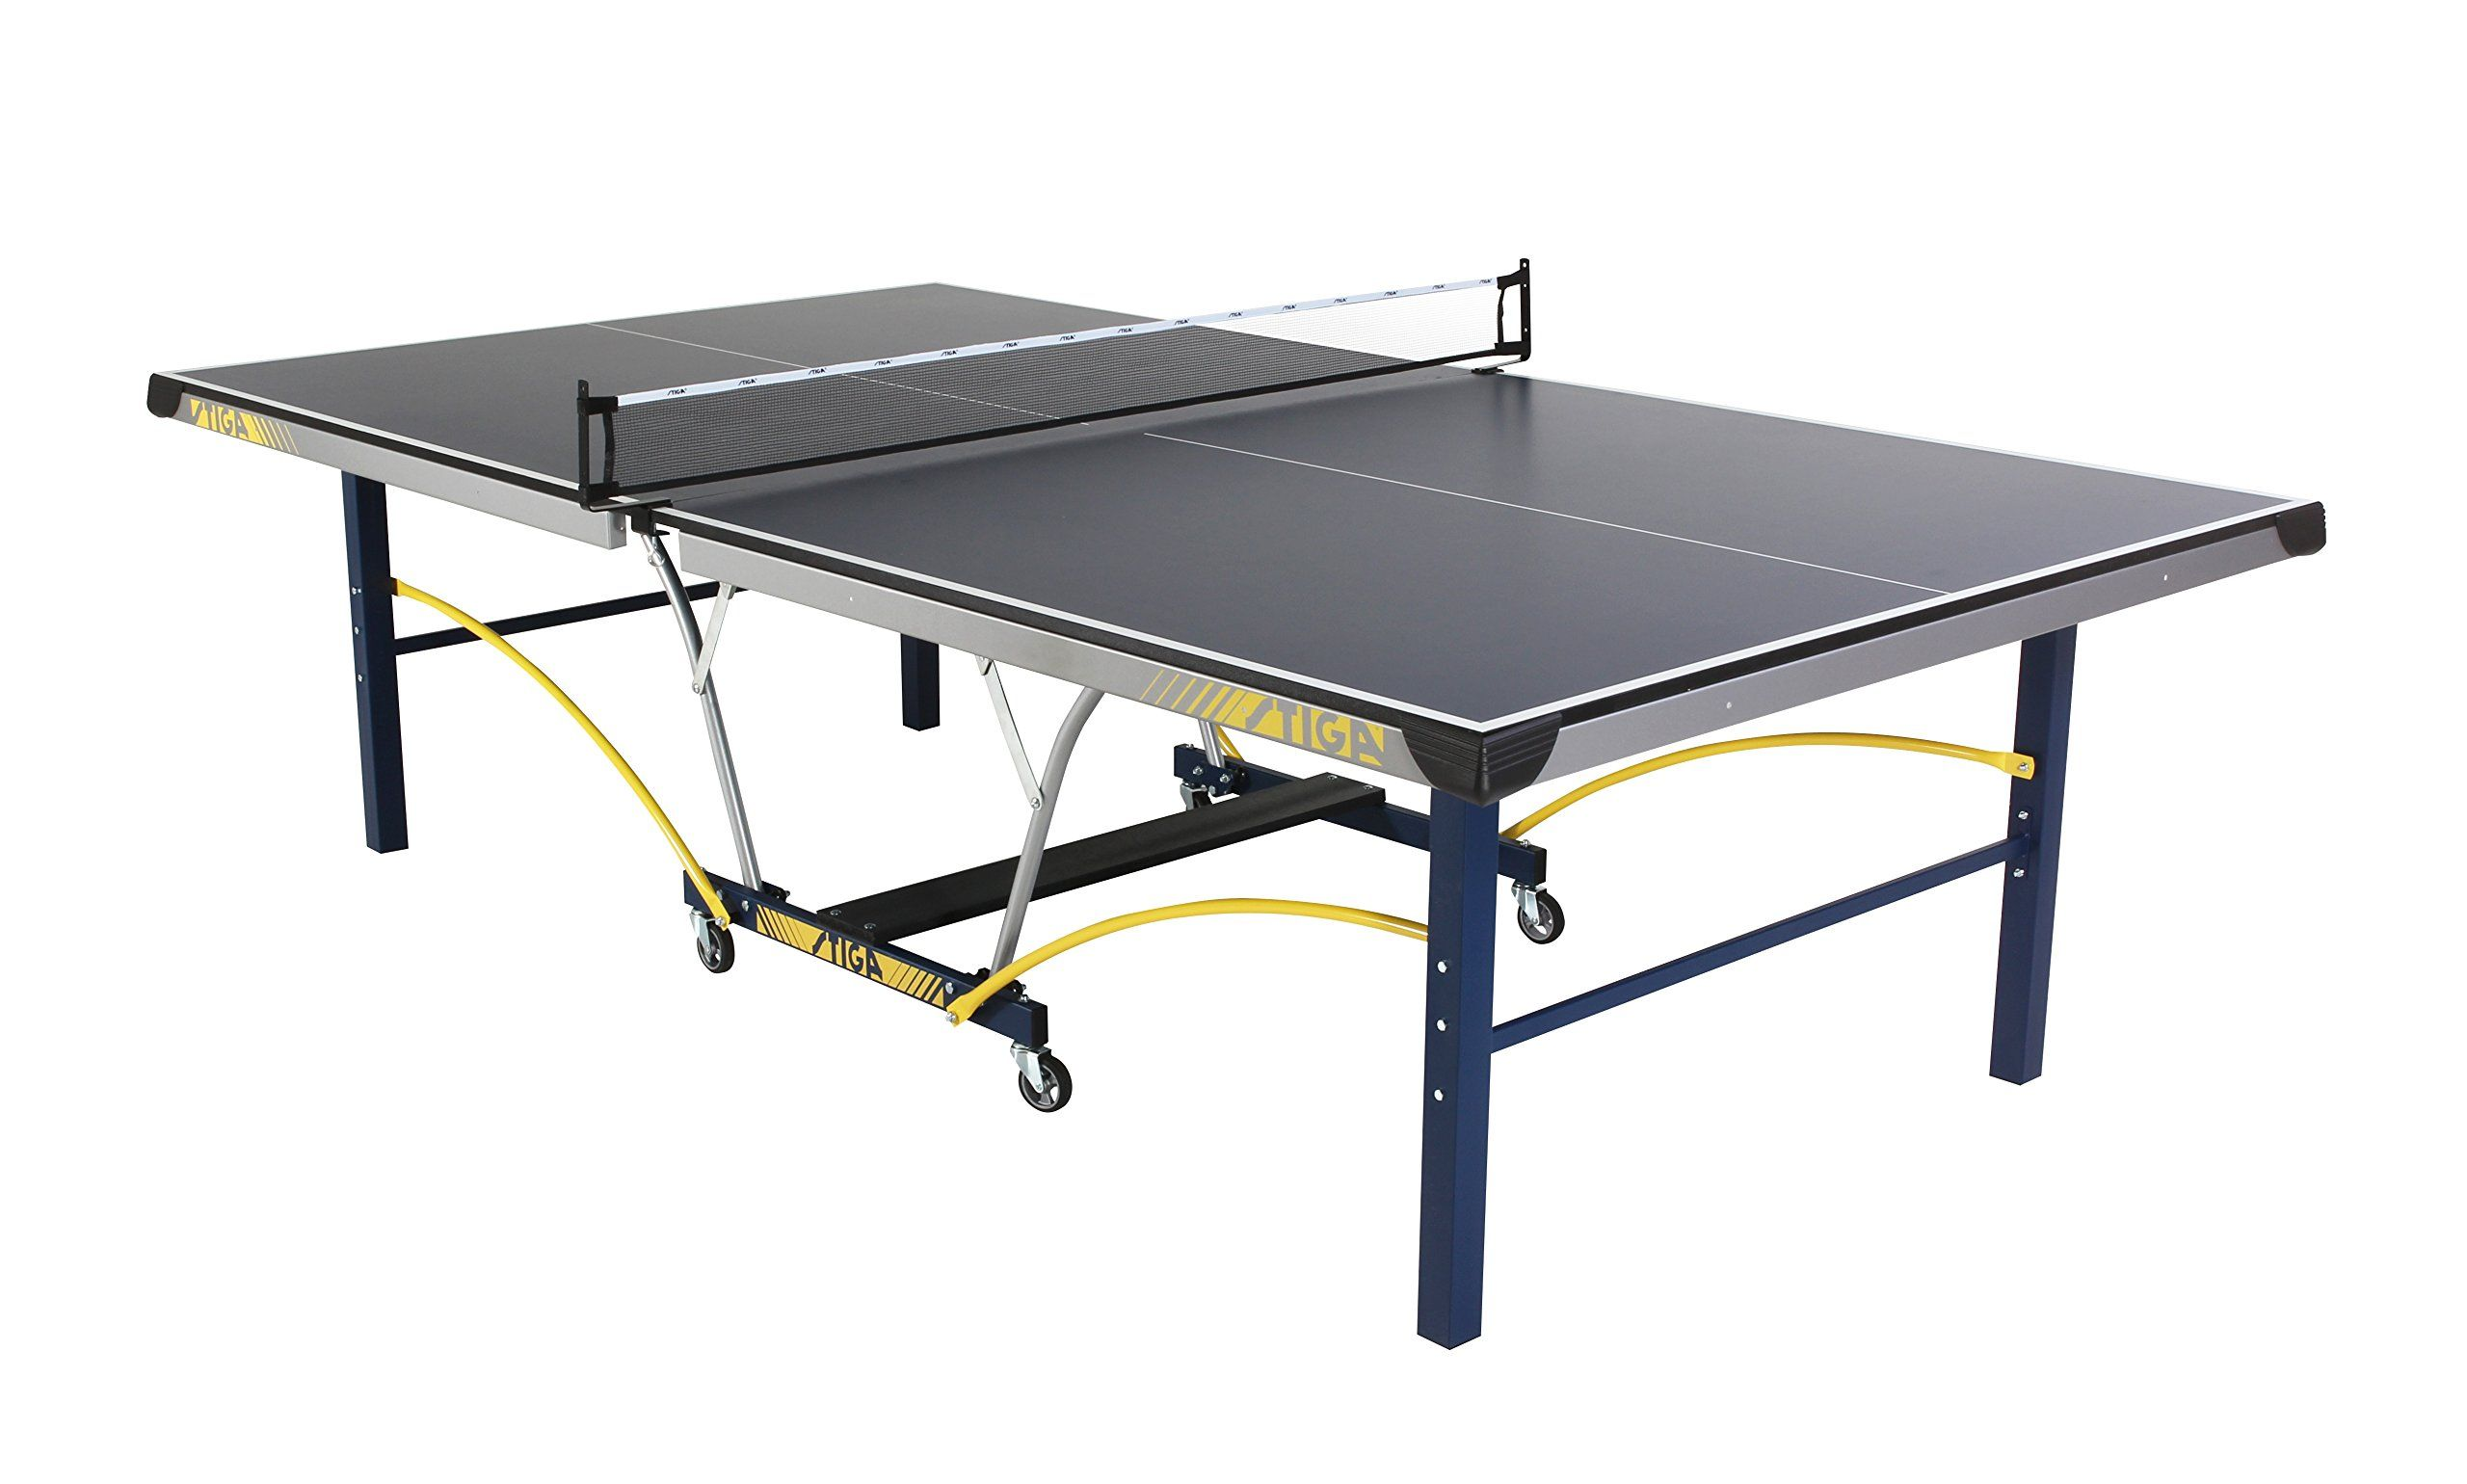 STIGA Triumph Table Tennis Table 435 looks pretty good